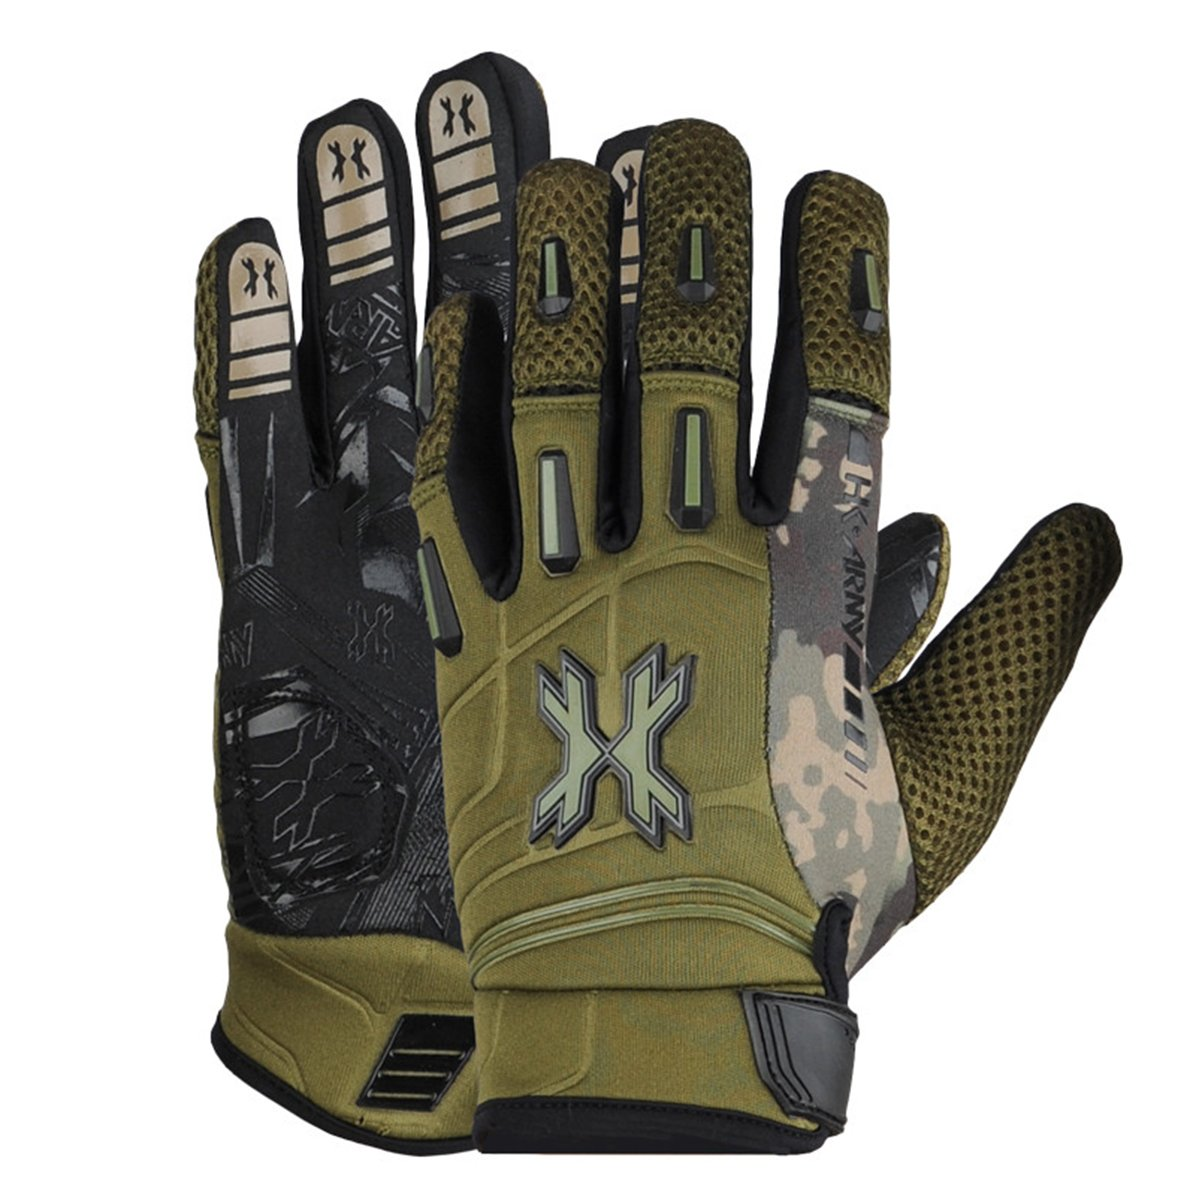 HK Army FULL FINGER Hardline Paintball Gloves (Olive HSTL Camo, Large) by HK Army